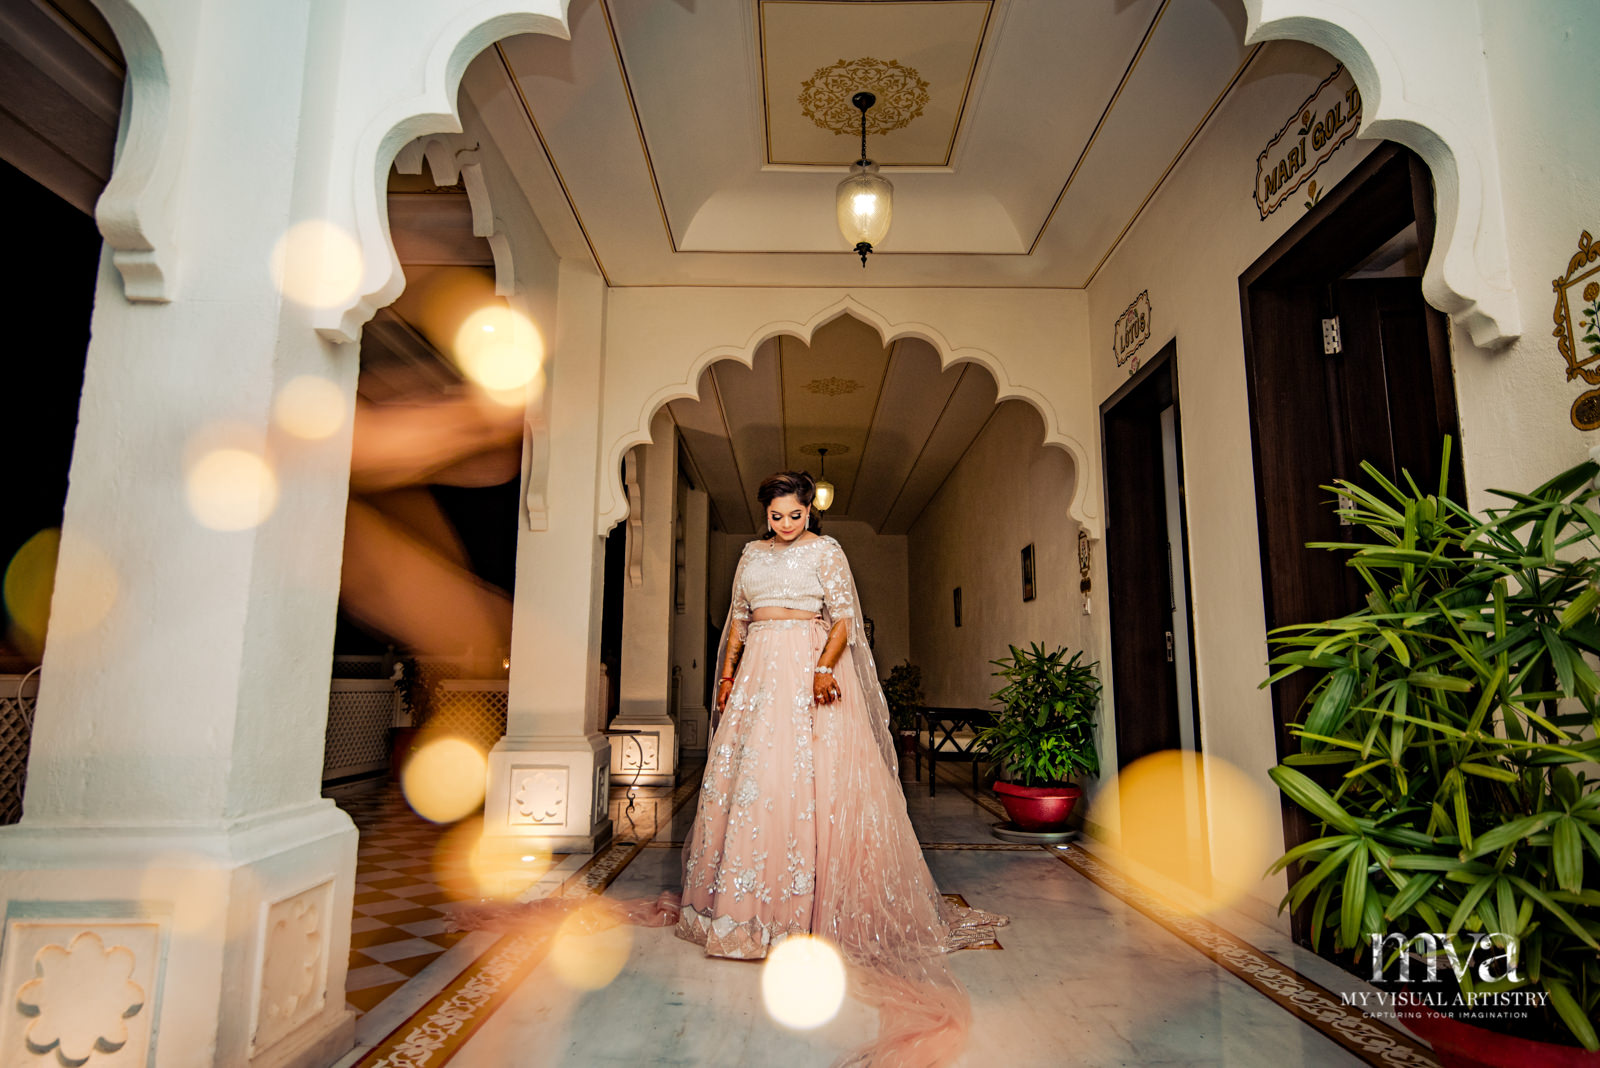 0453 -Vani_Sarang_ Photographer_My Visual Artistry_Wedding_MVA_Destination-9196.jpg